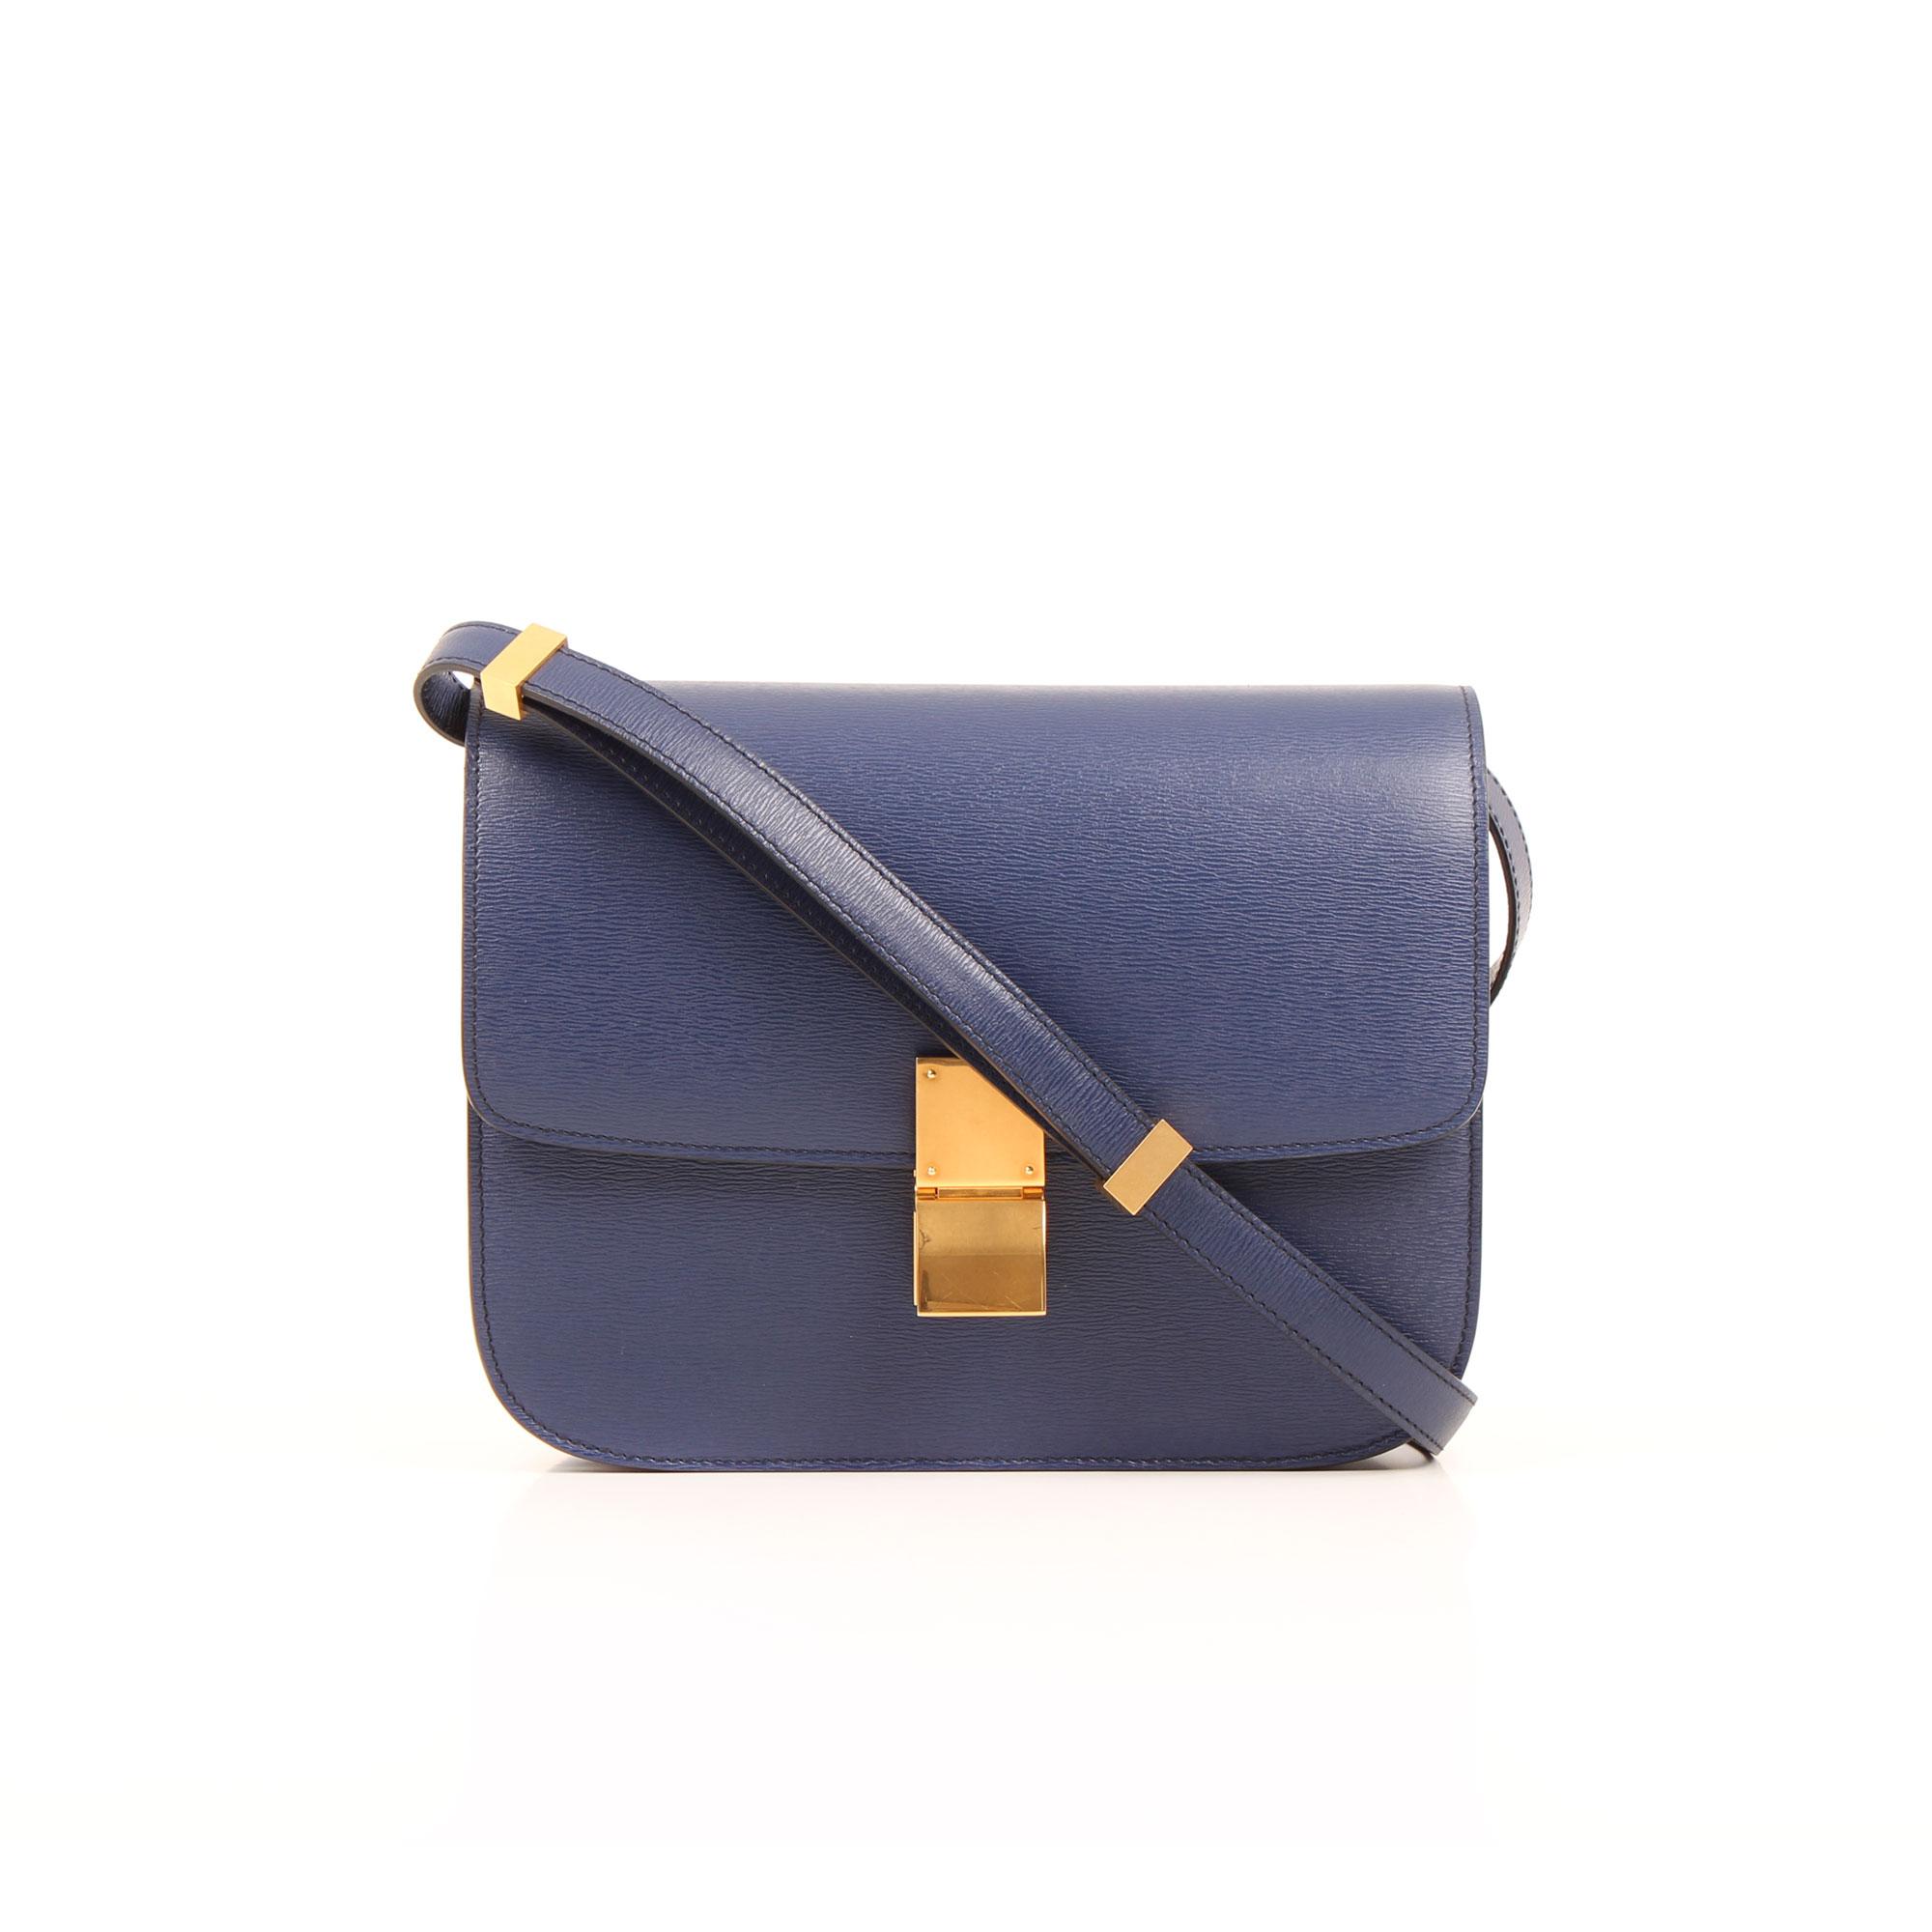 0d32a4ae2679 Front image of celine box blue bag